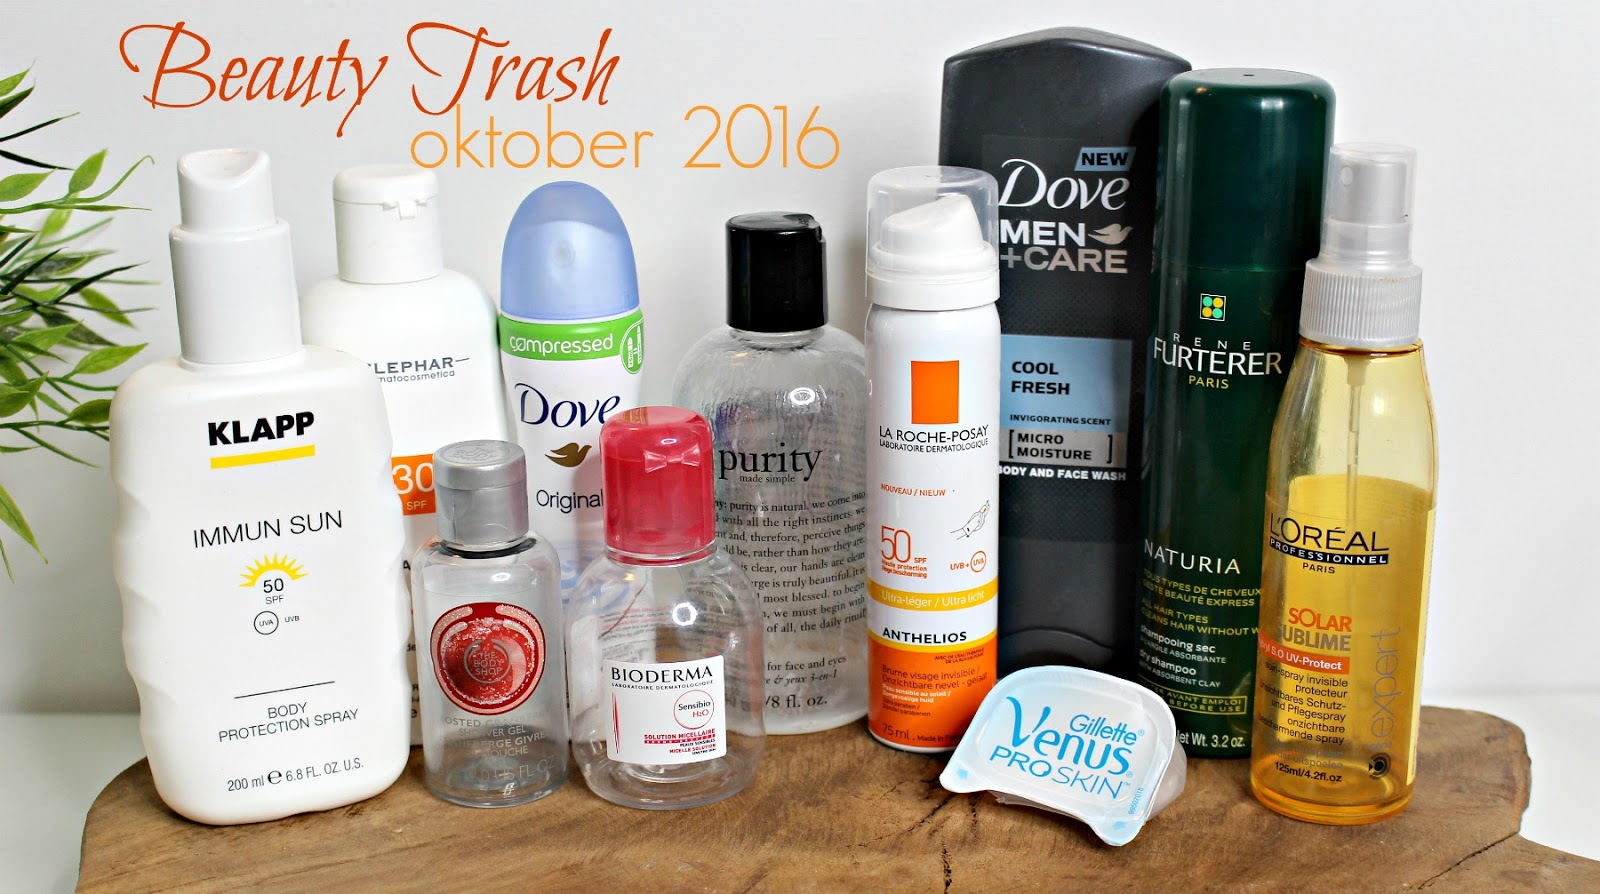 beauty trash oktober 2016